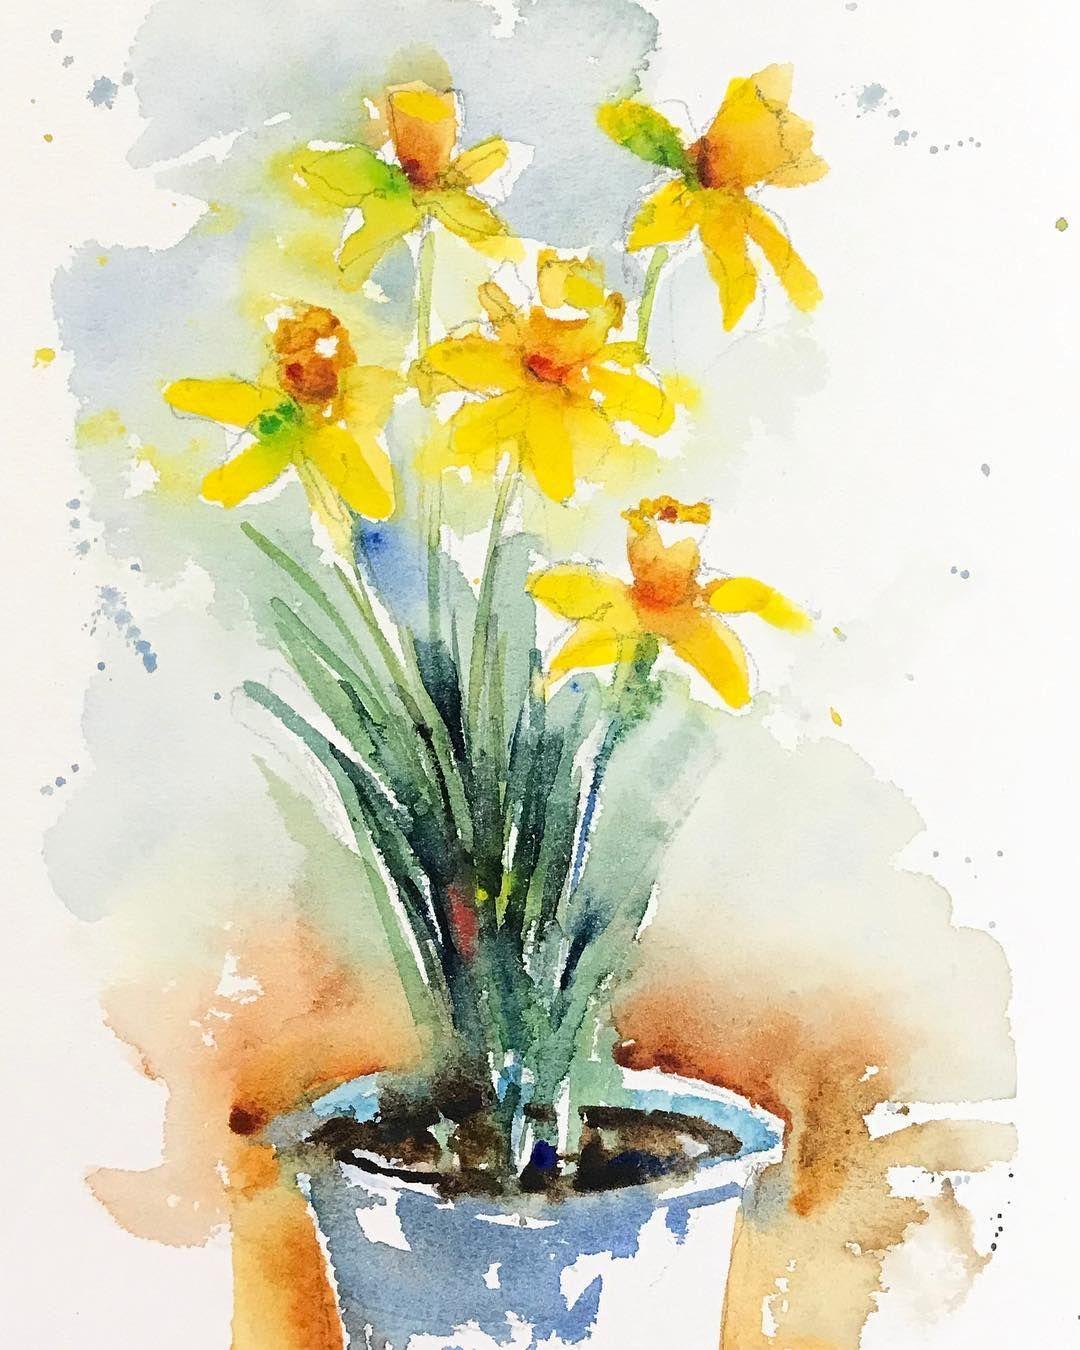 Early Daffodils Fleur Flower Daffodils Jonquilles Daffodil